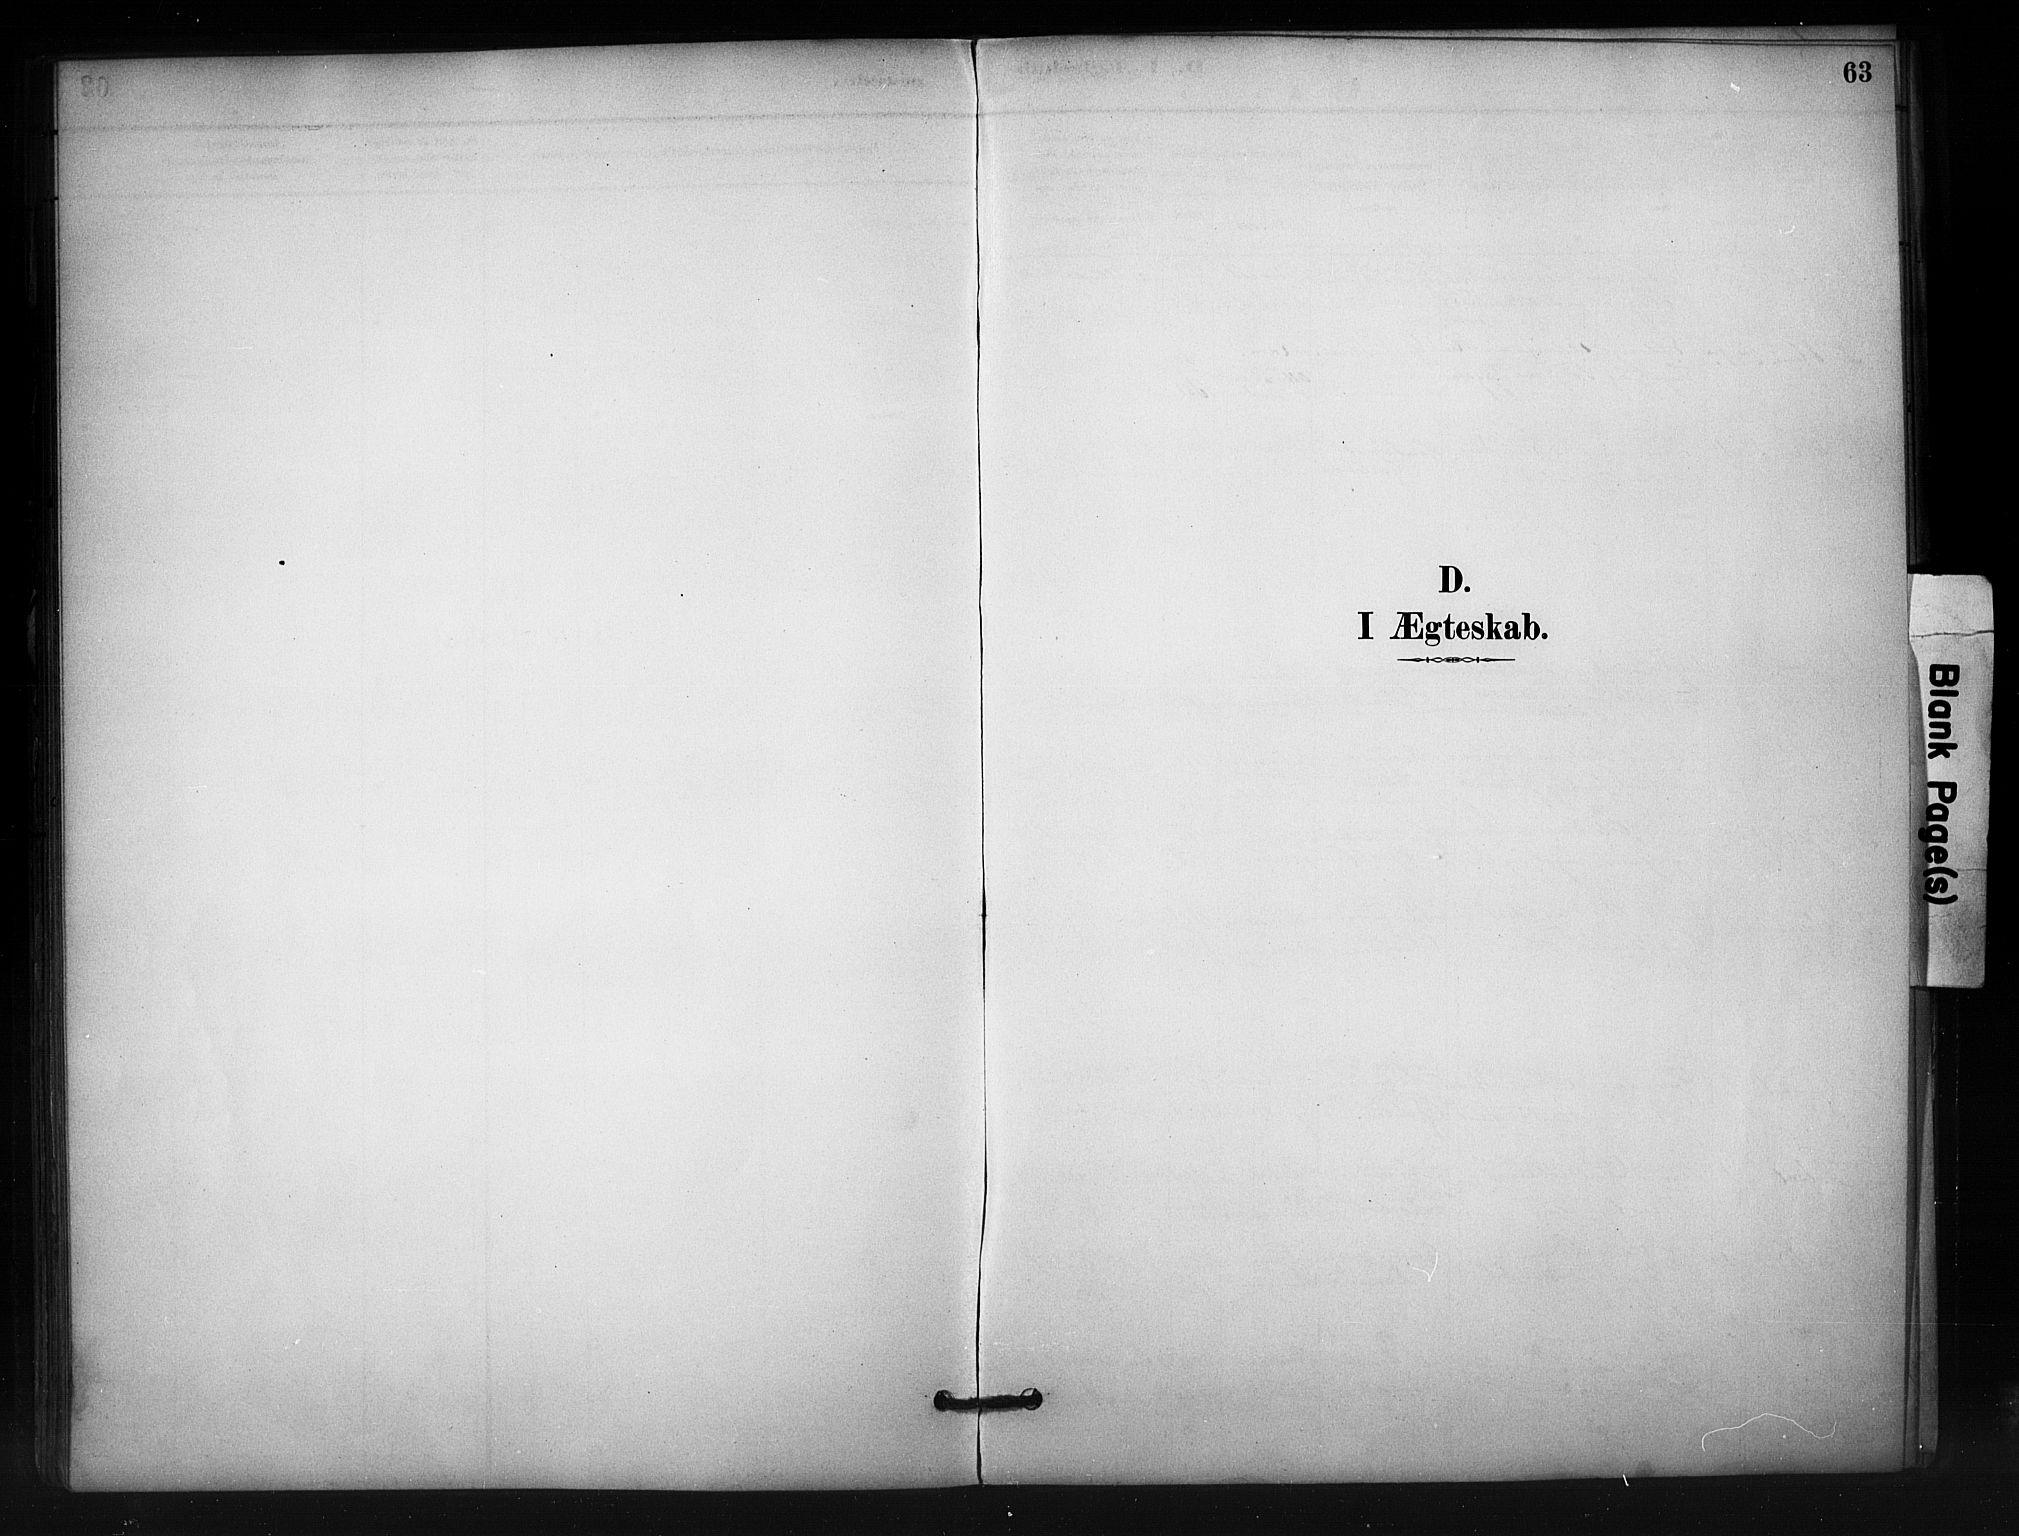 SAH, Nord-Aurdal prestekontor, Ministerialbok nr. 12, 1883-1895, s. 63